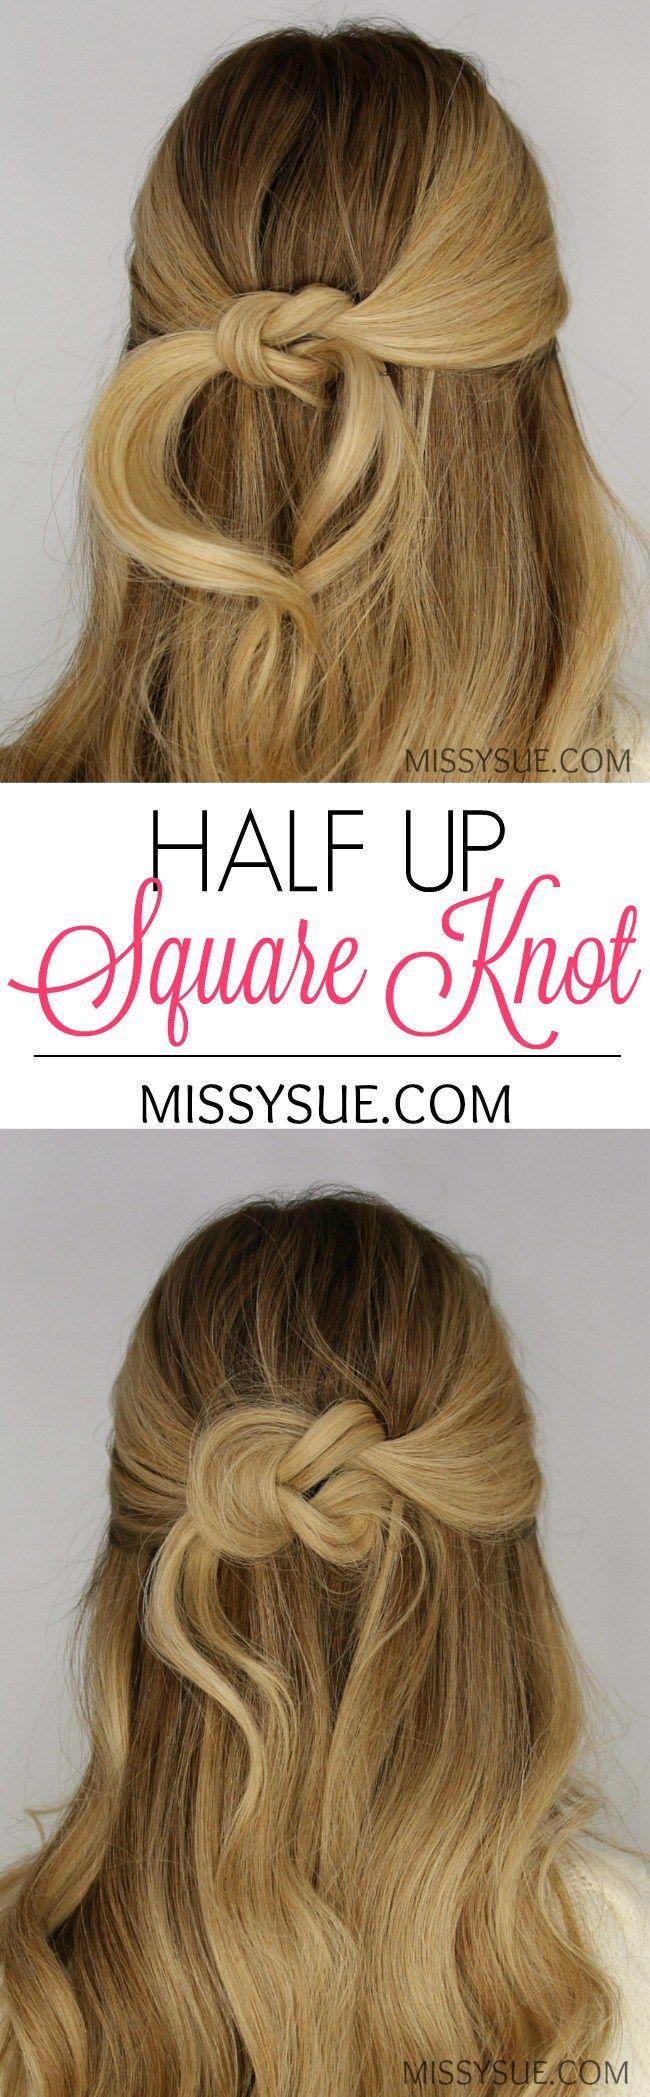 half-up-square-knot-tutorial-missysueblog